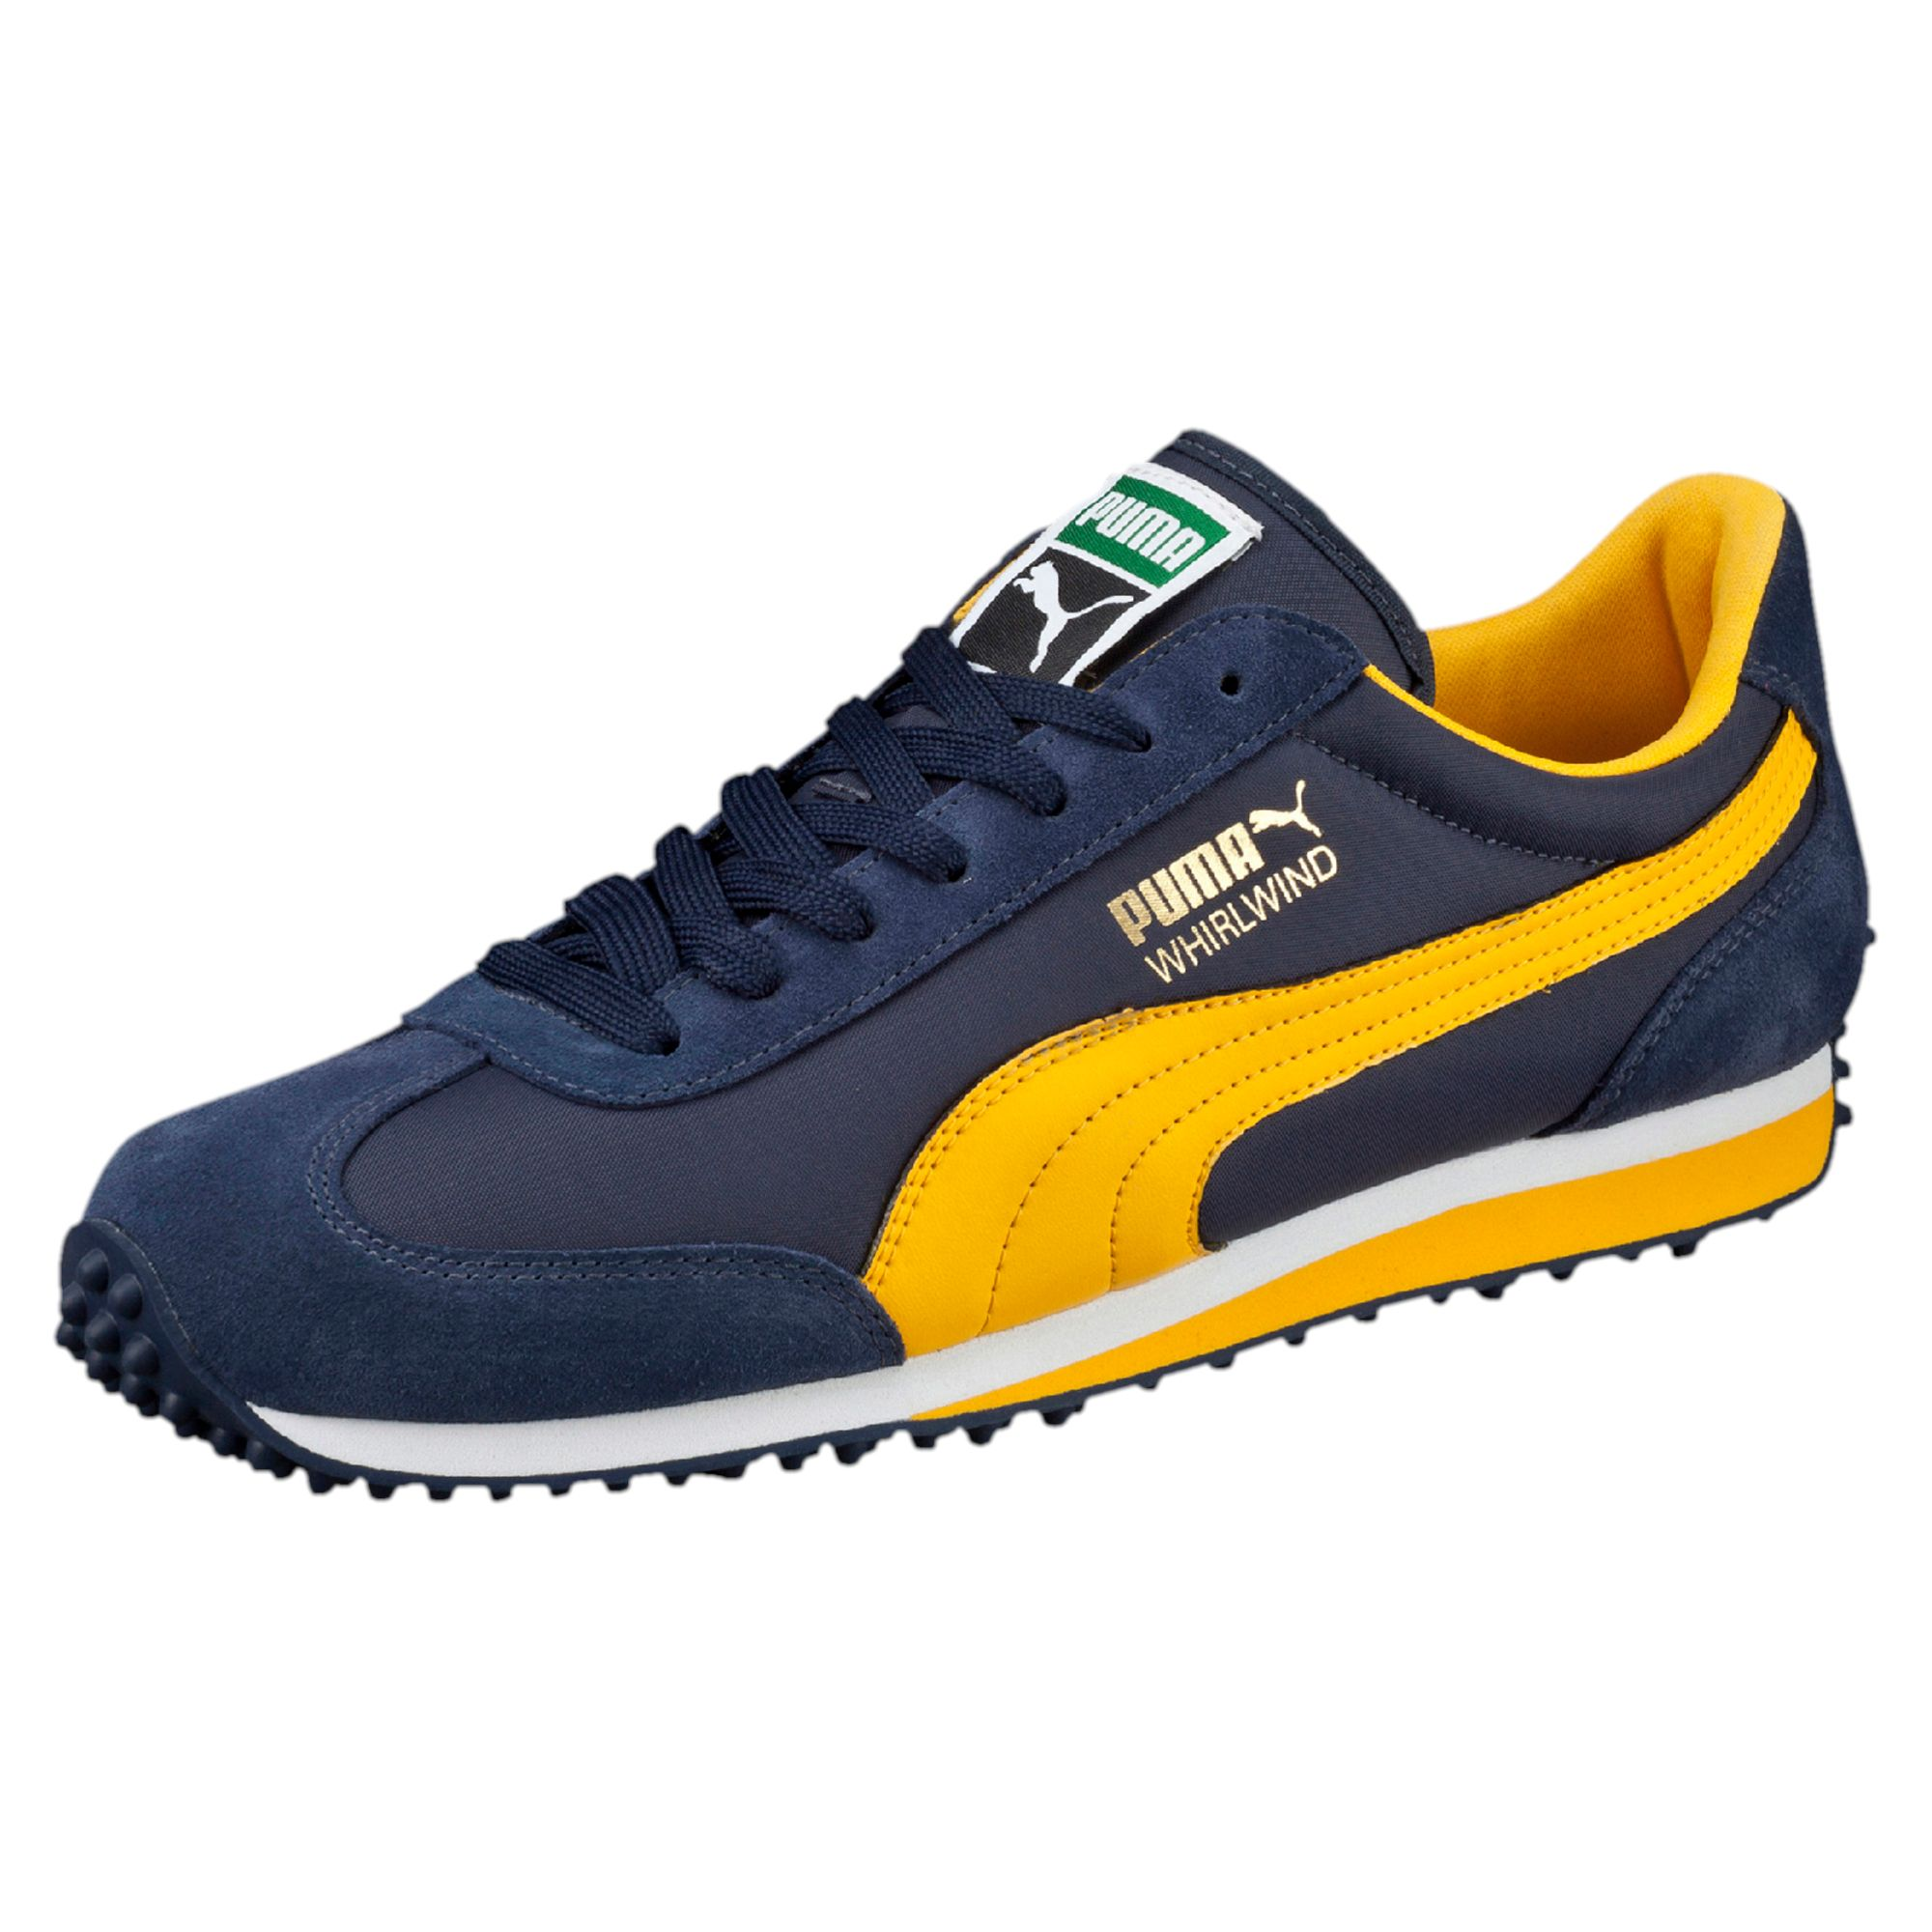 Puma whirlwind puma-whirlwind-classic-men-039-s-sneakers UGXUPCE